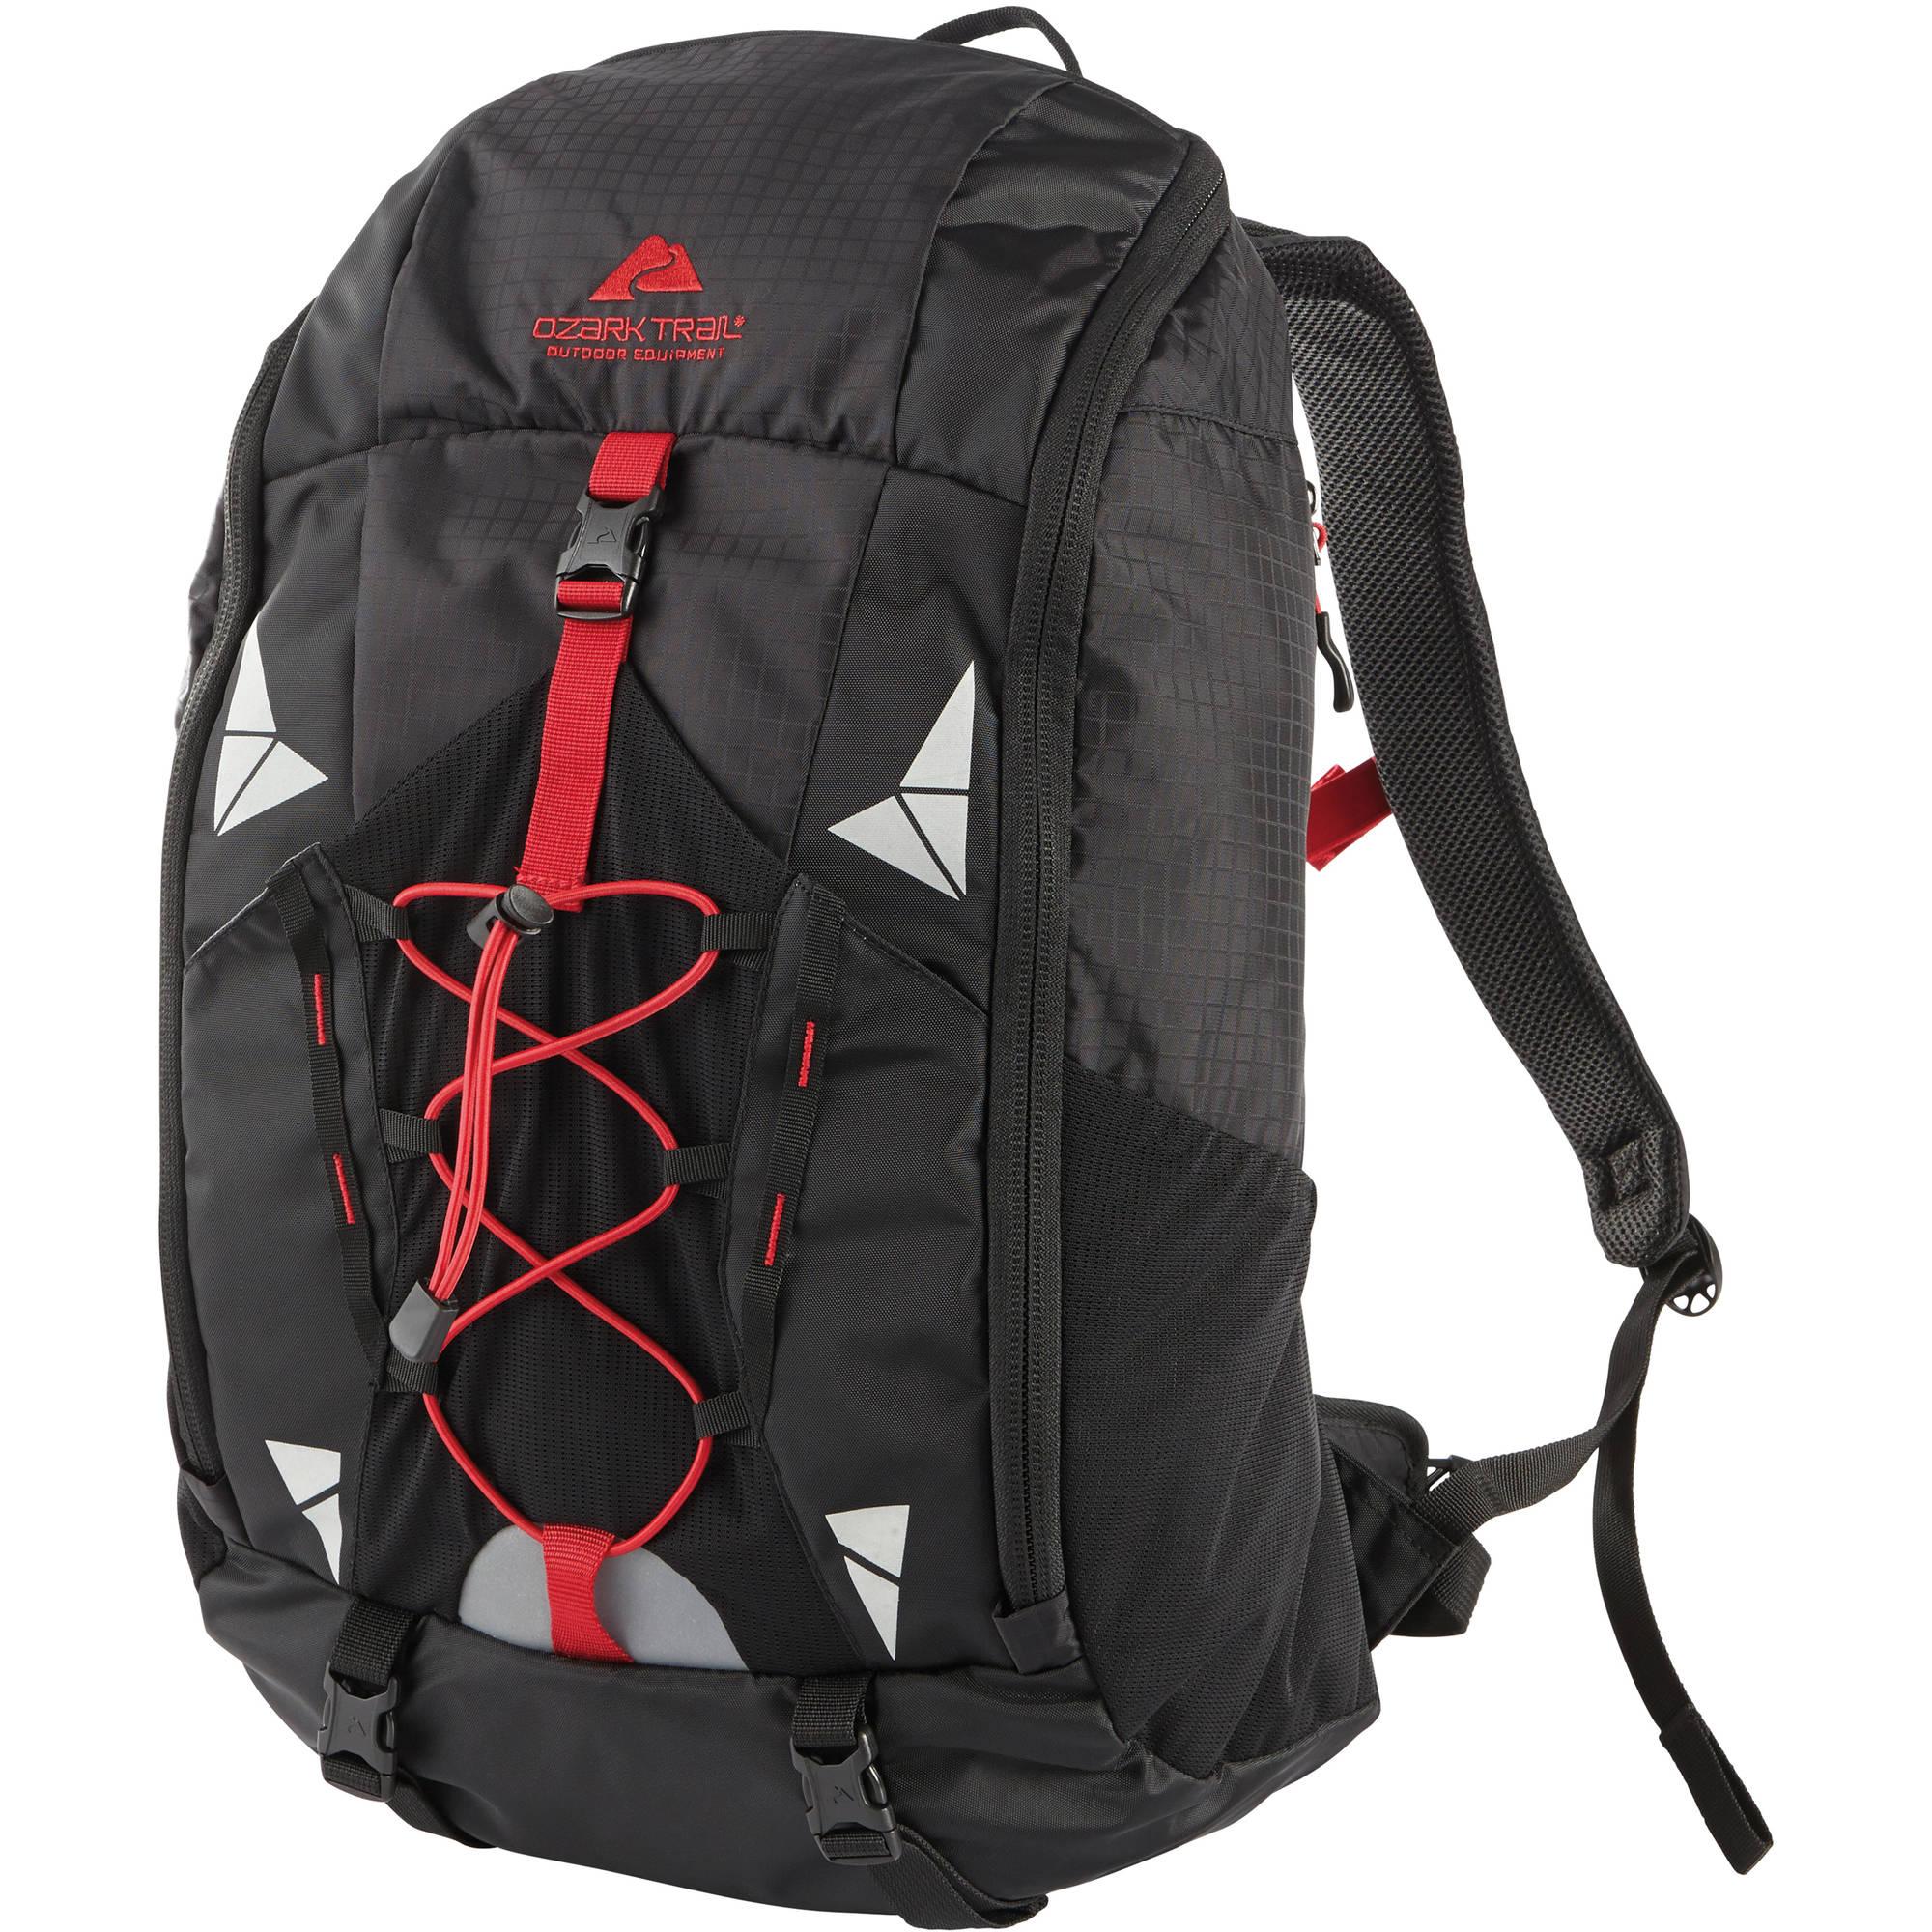 Ozark Trail 40L Crestone Backpack (Black or Orange)  $20 + Free Store Pick-Up